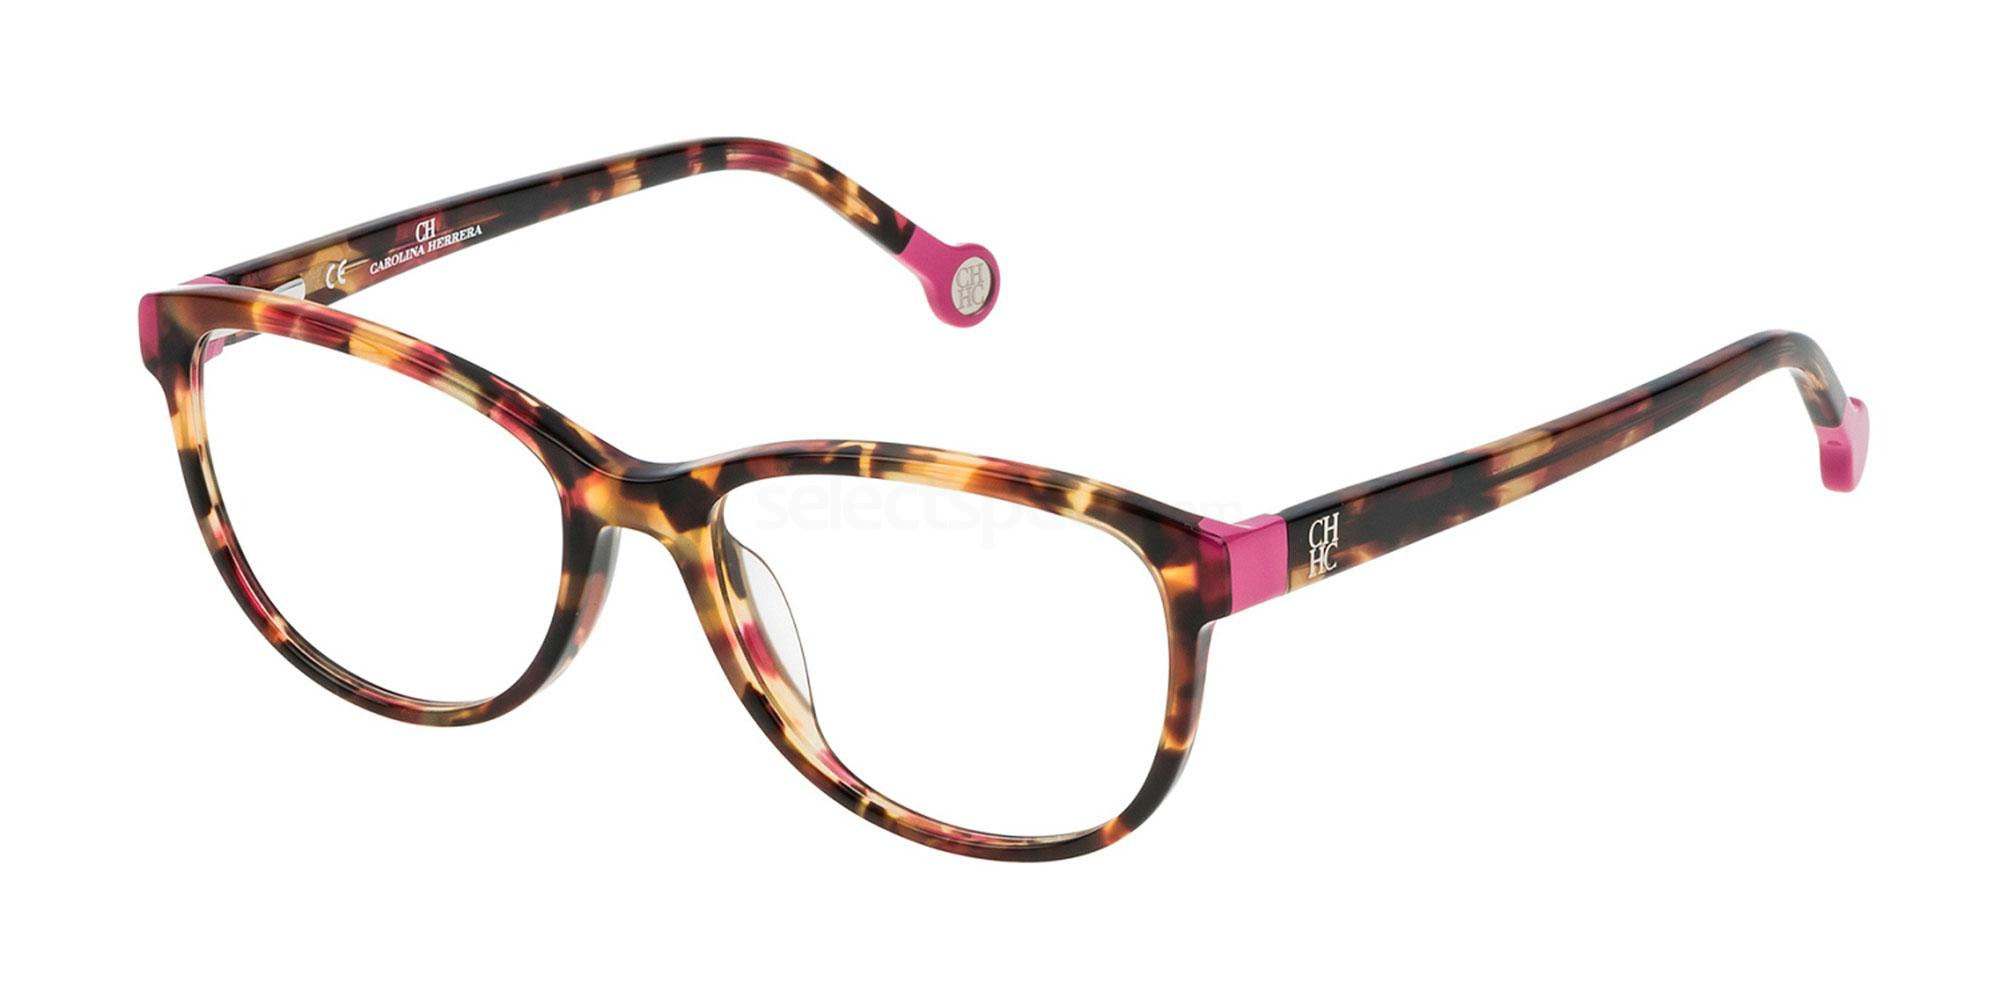 01GQ VHE678 Glasses, CH Carolina Herrera